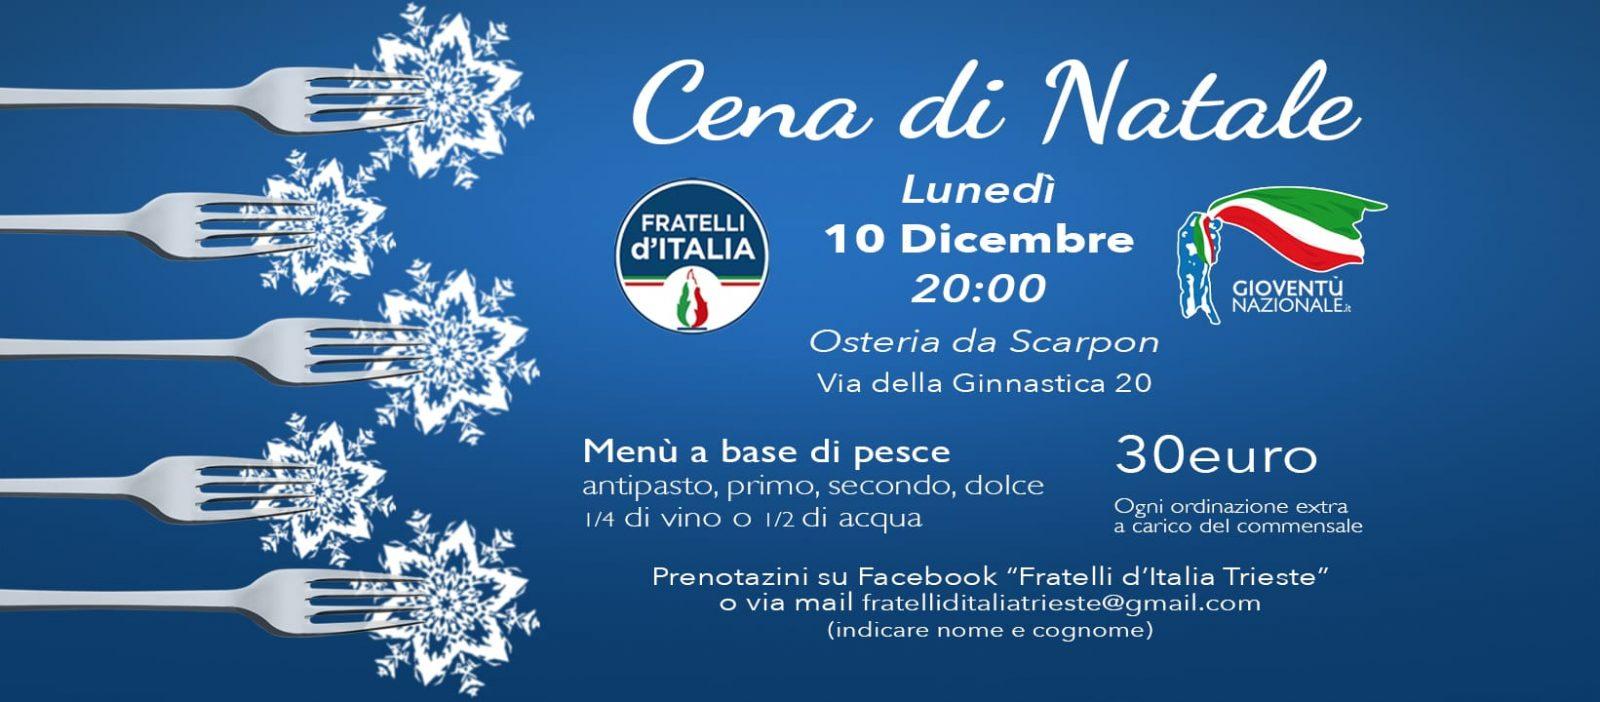 Cena di Natale 2018 @ Osteria de Scarpon | Trieste | Friuli-Venezia Giulia | Italia